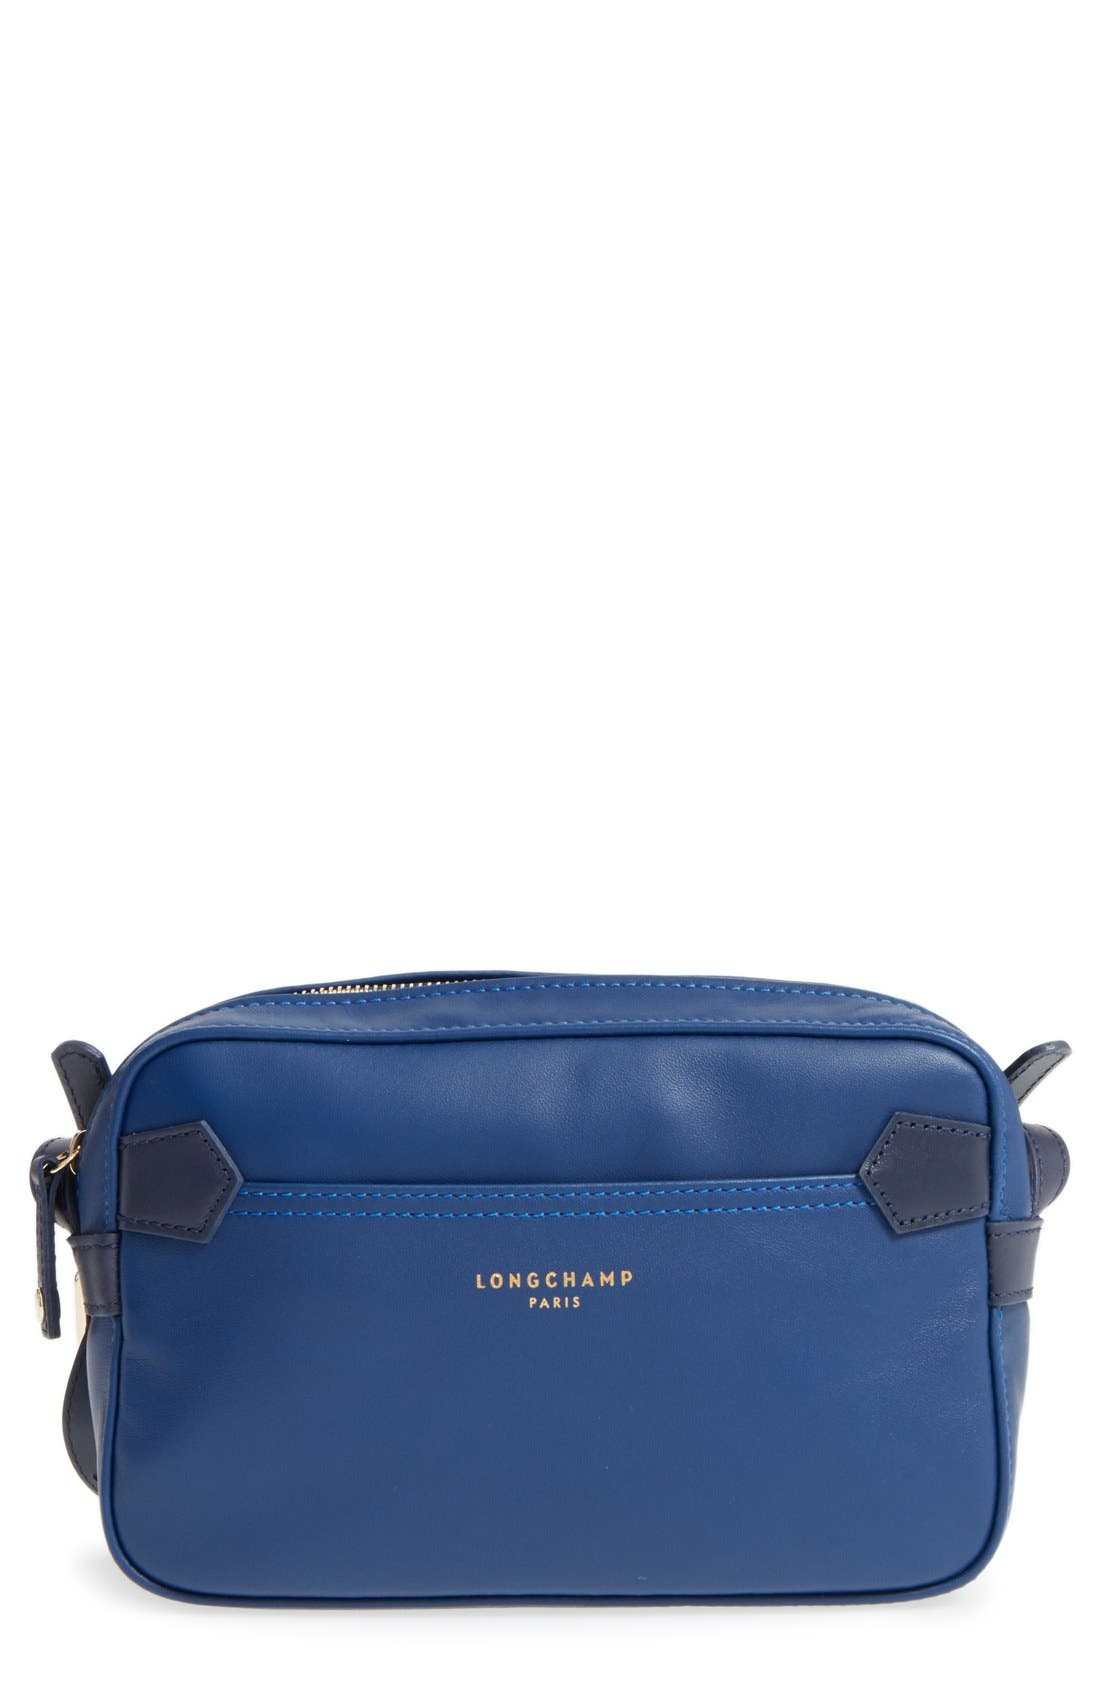 Main Image - Longchamp '2.0' Two-Tone Leather Crossbody Bag